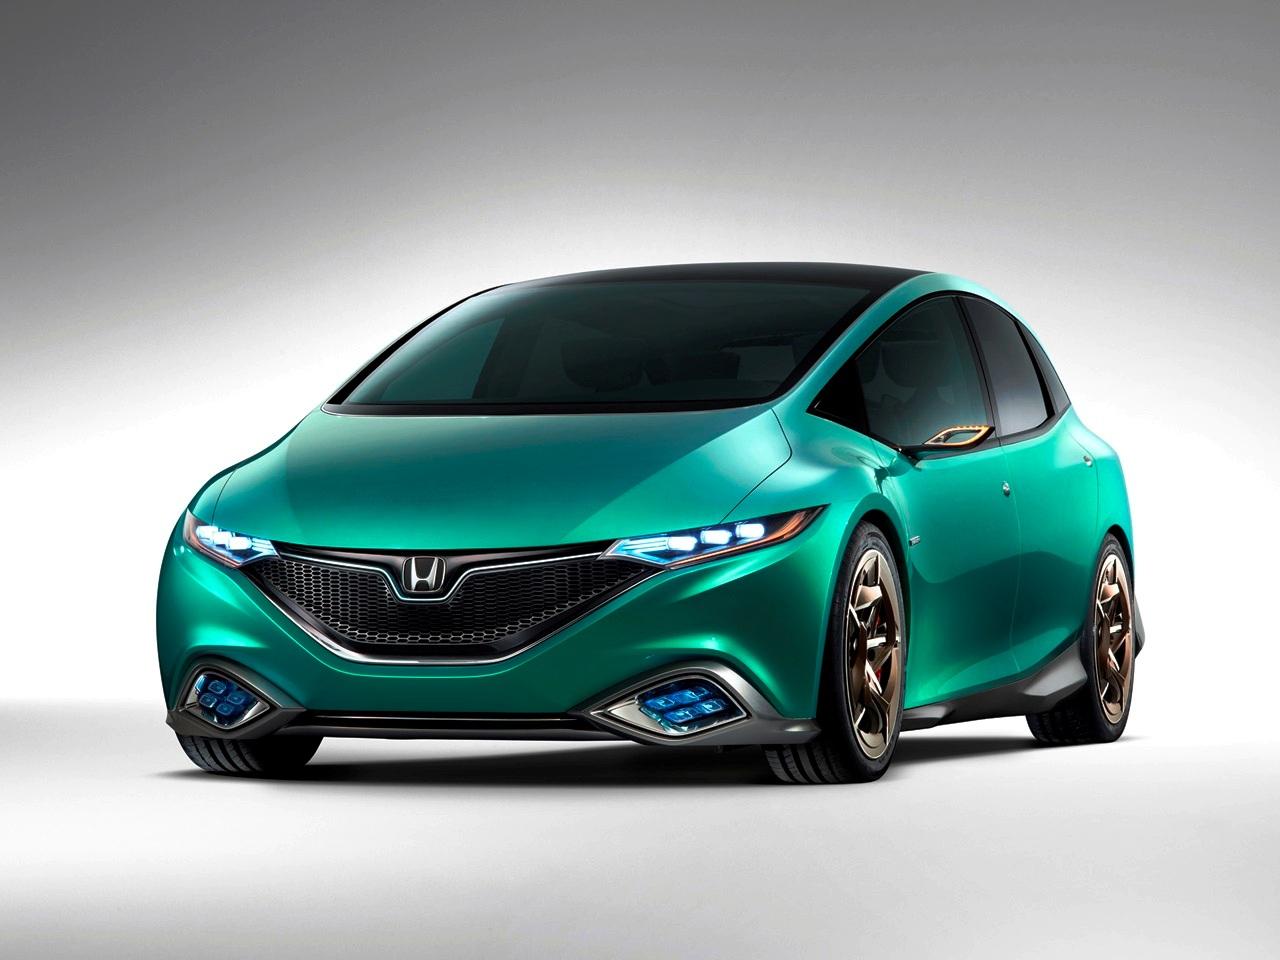 2012 honda s hybrid stylish smart and surprise concept for Honda smart car